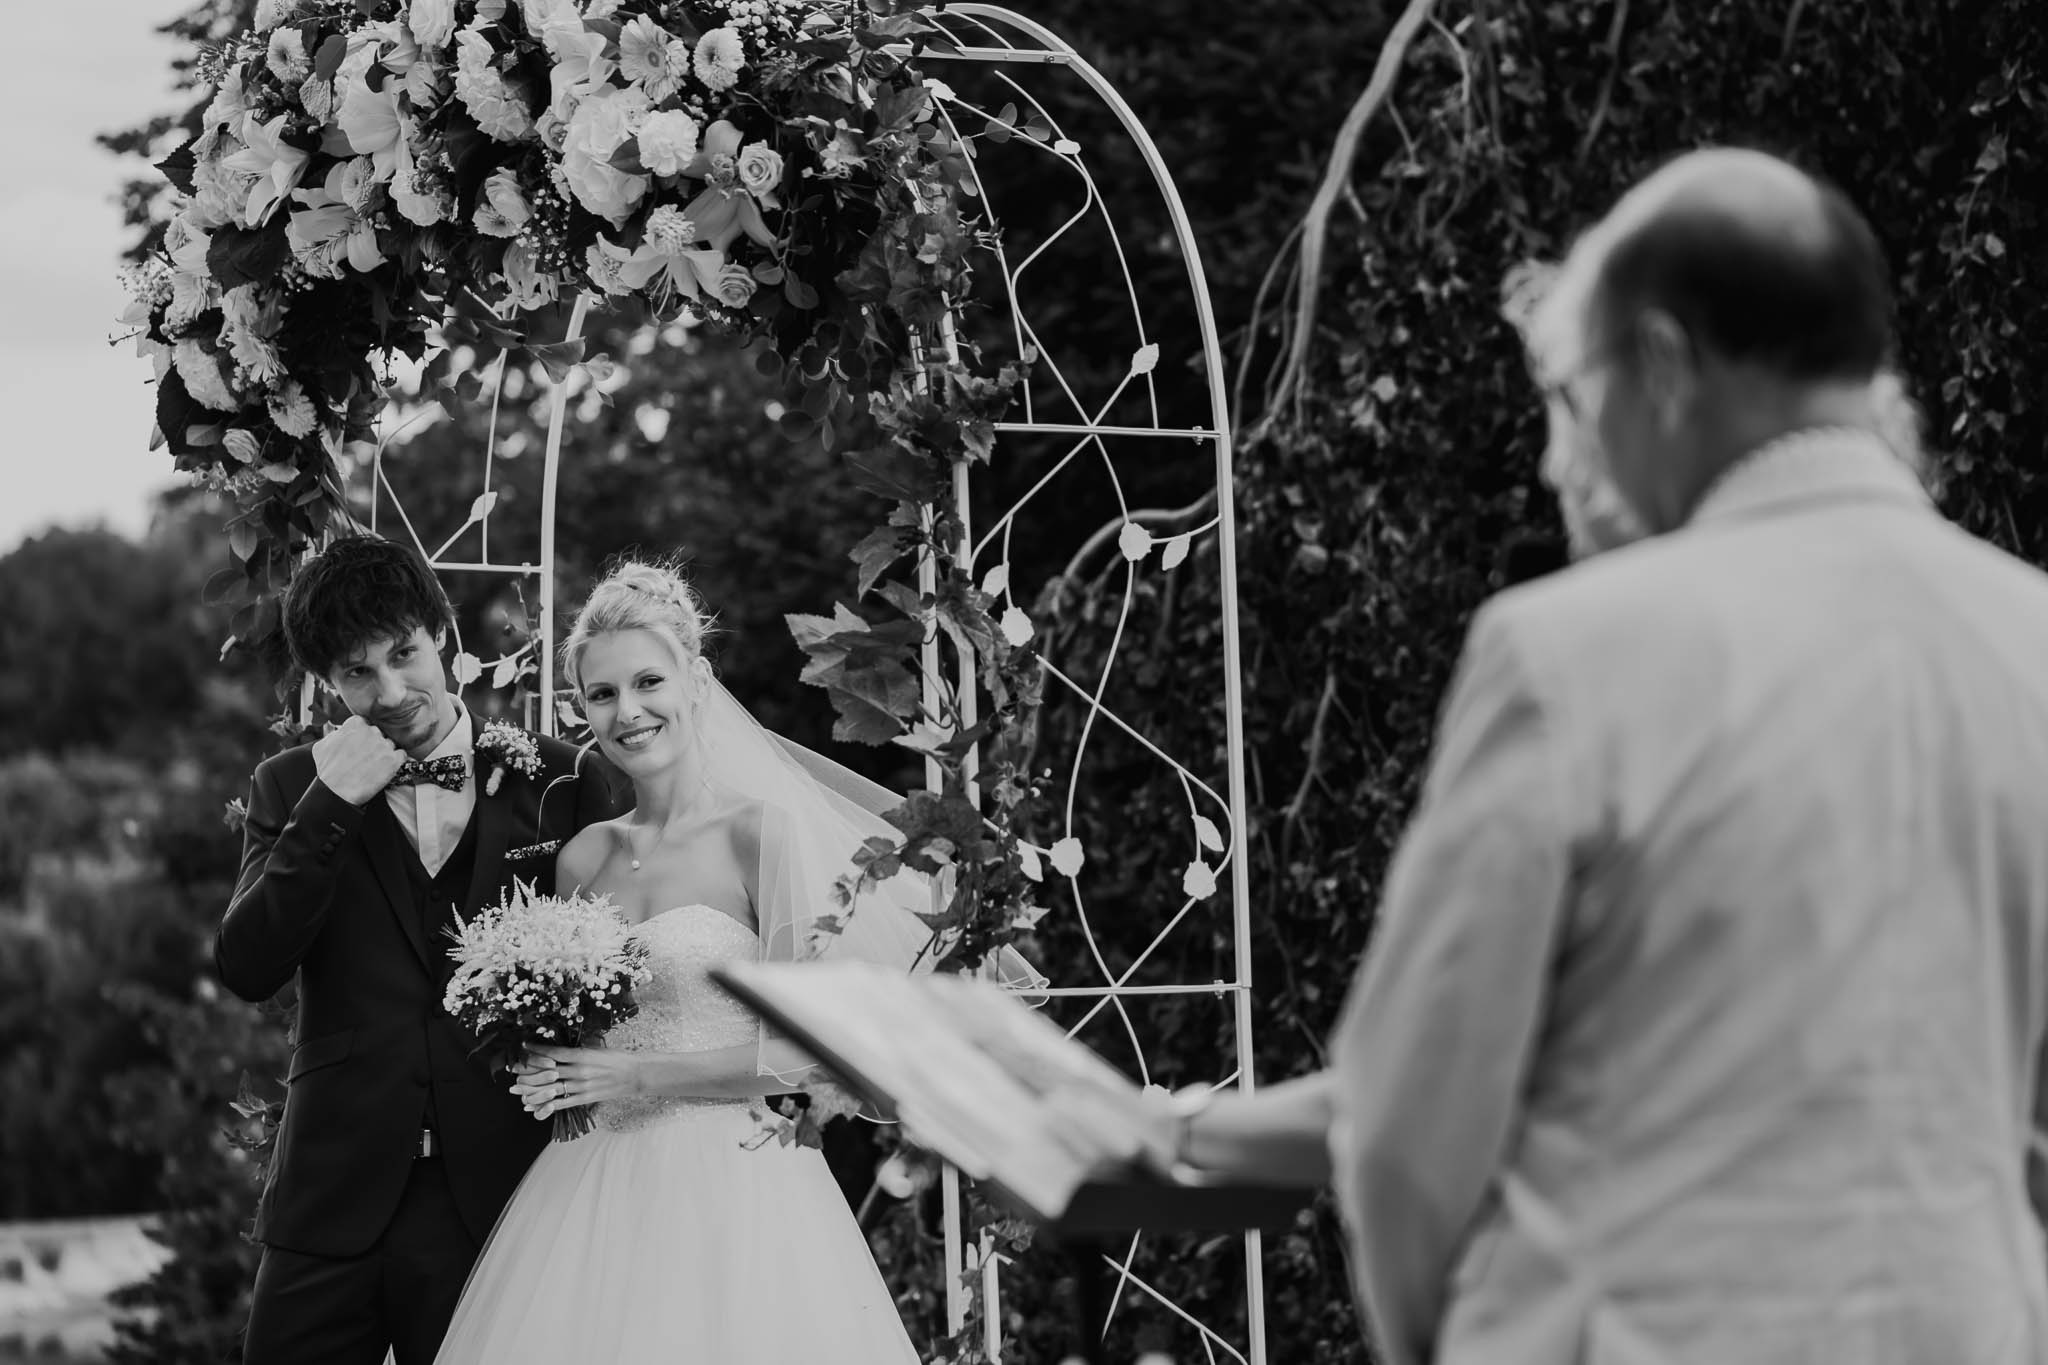 mariage-chateau-gaudras-ingold-42.jpg